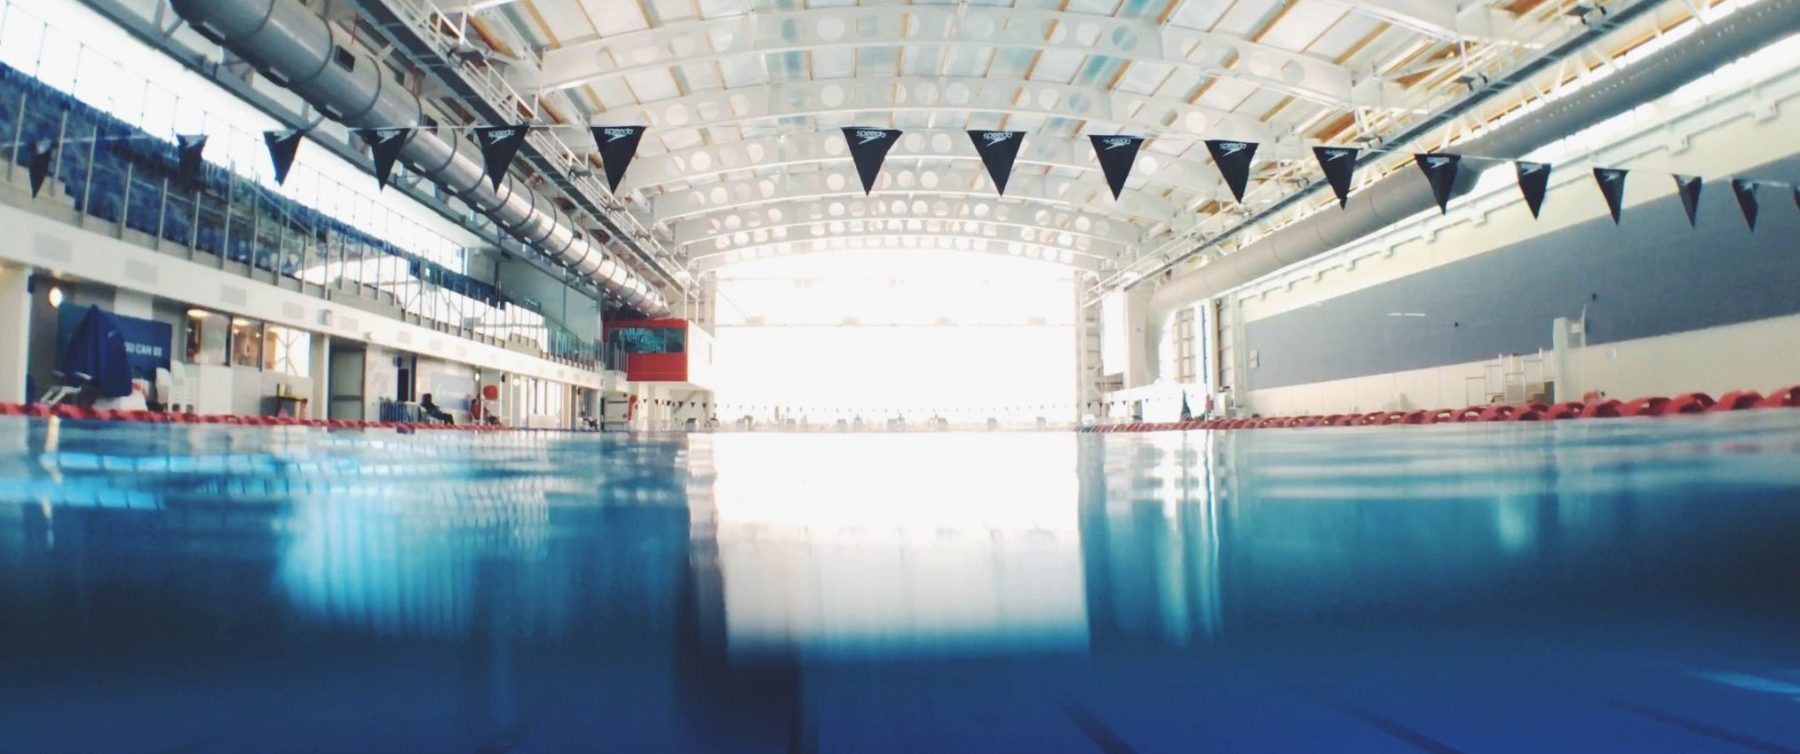 College Swimming